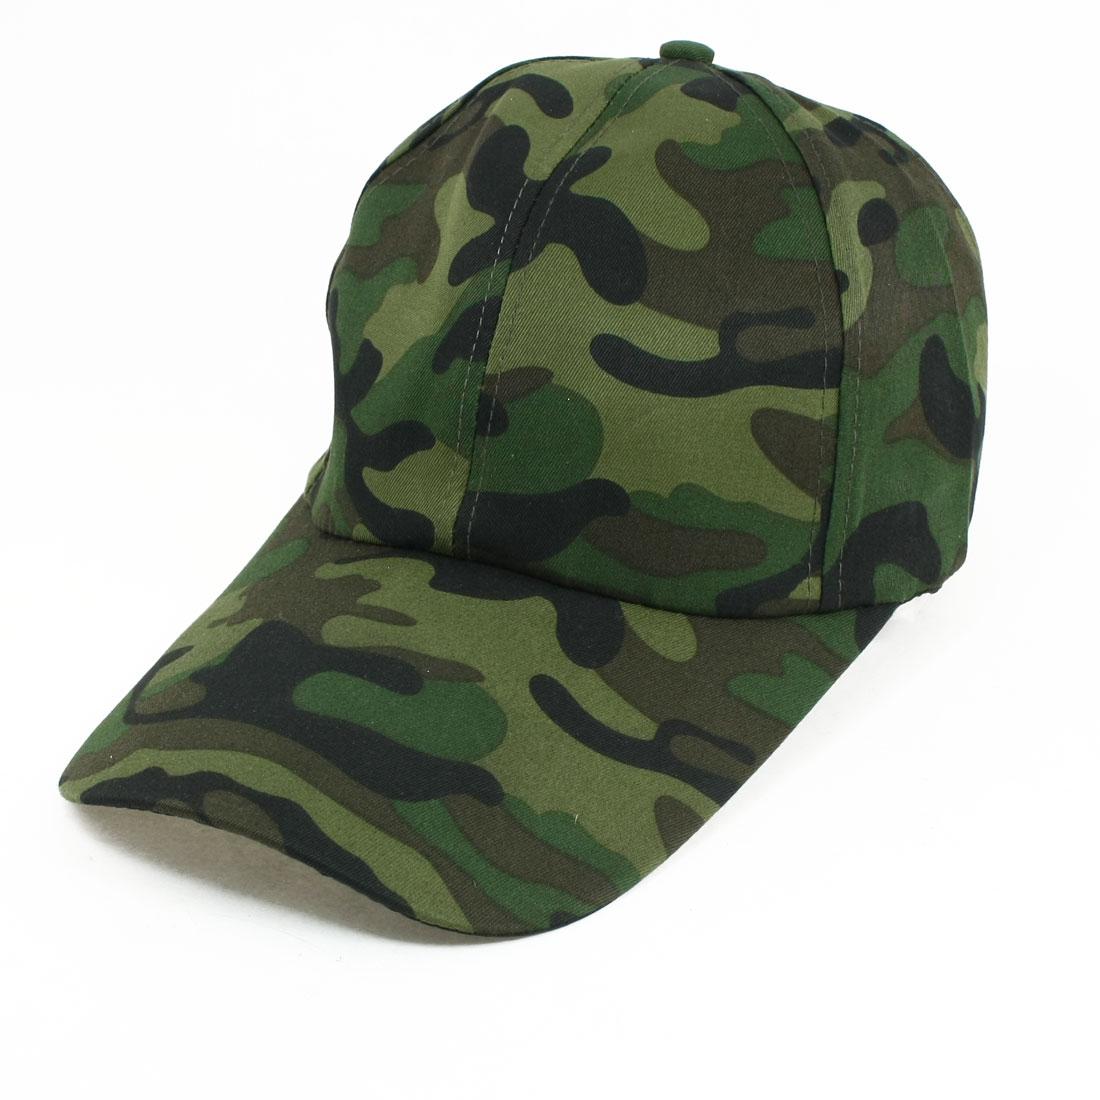 Man Women Adjuster Vest Buckle Multicolor Camouflage Pattern Sun Visor Cap Hat